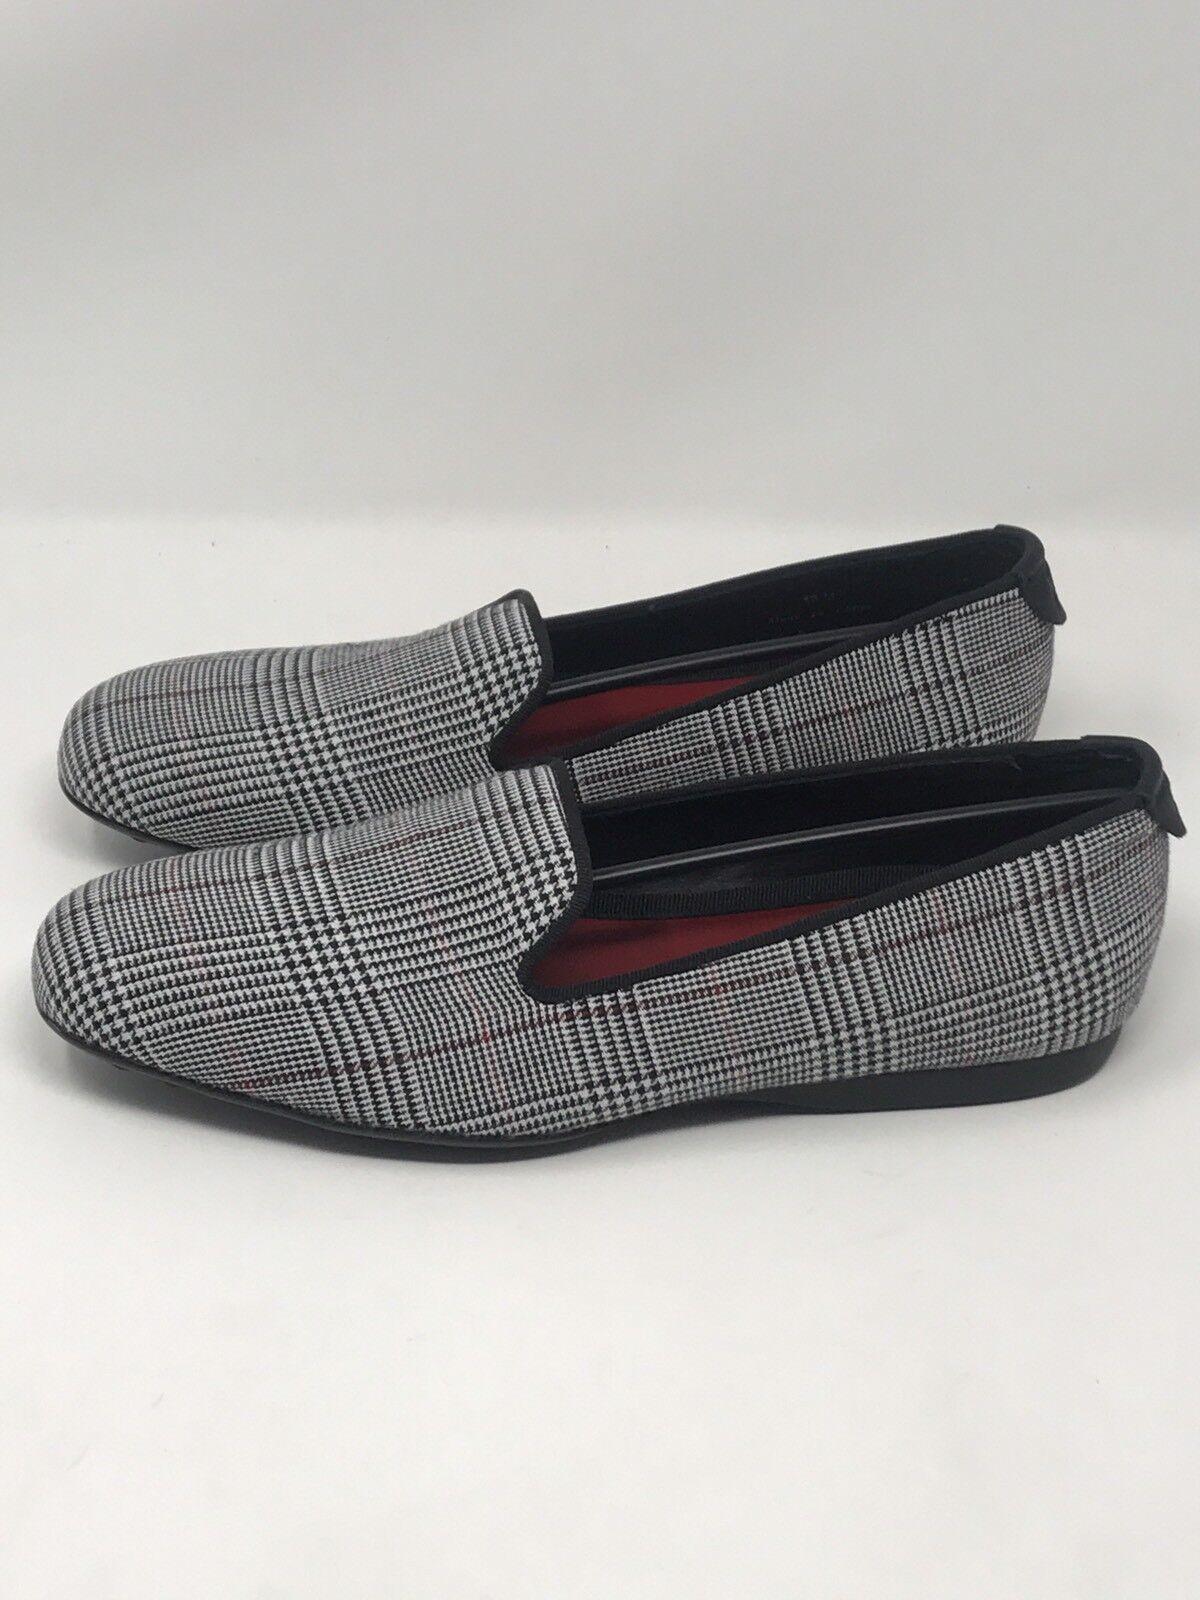 vendita outlet Loafer Slip On Uomo Casual scarpe scarpe scarpe BULL + TASSEL Glen New In Box  nuovi prodotti novità